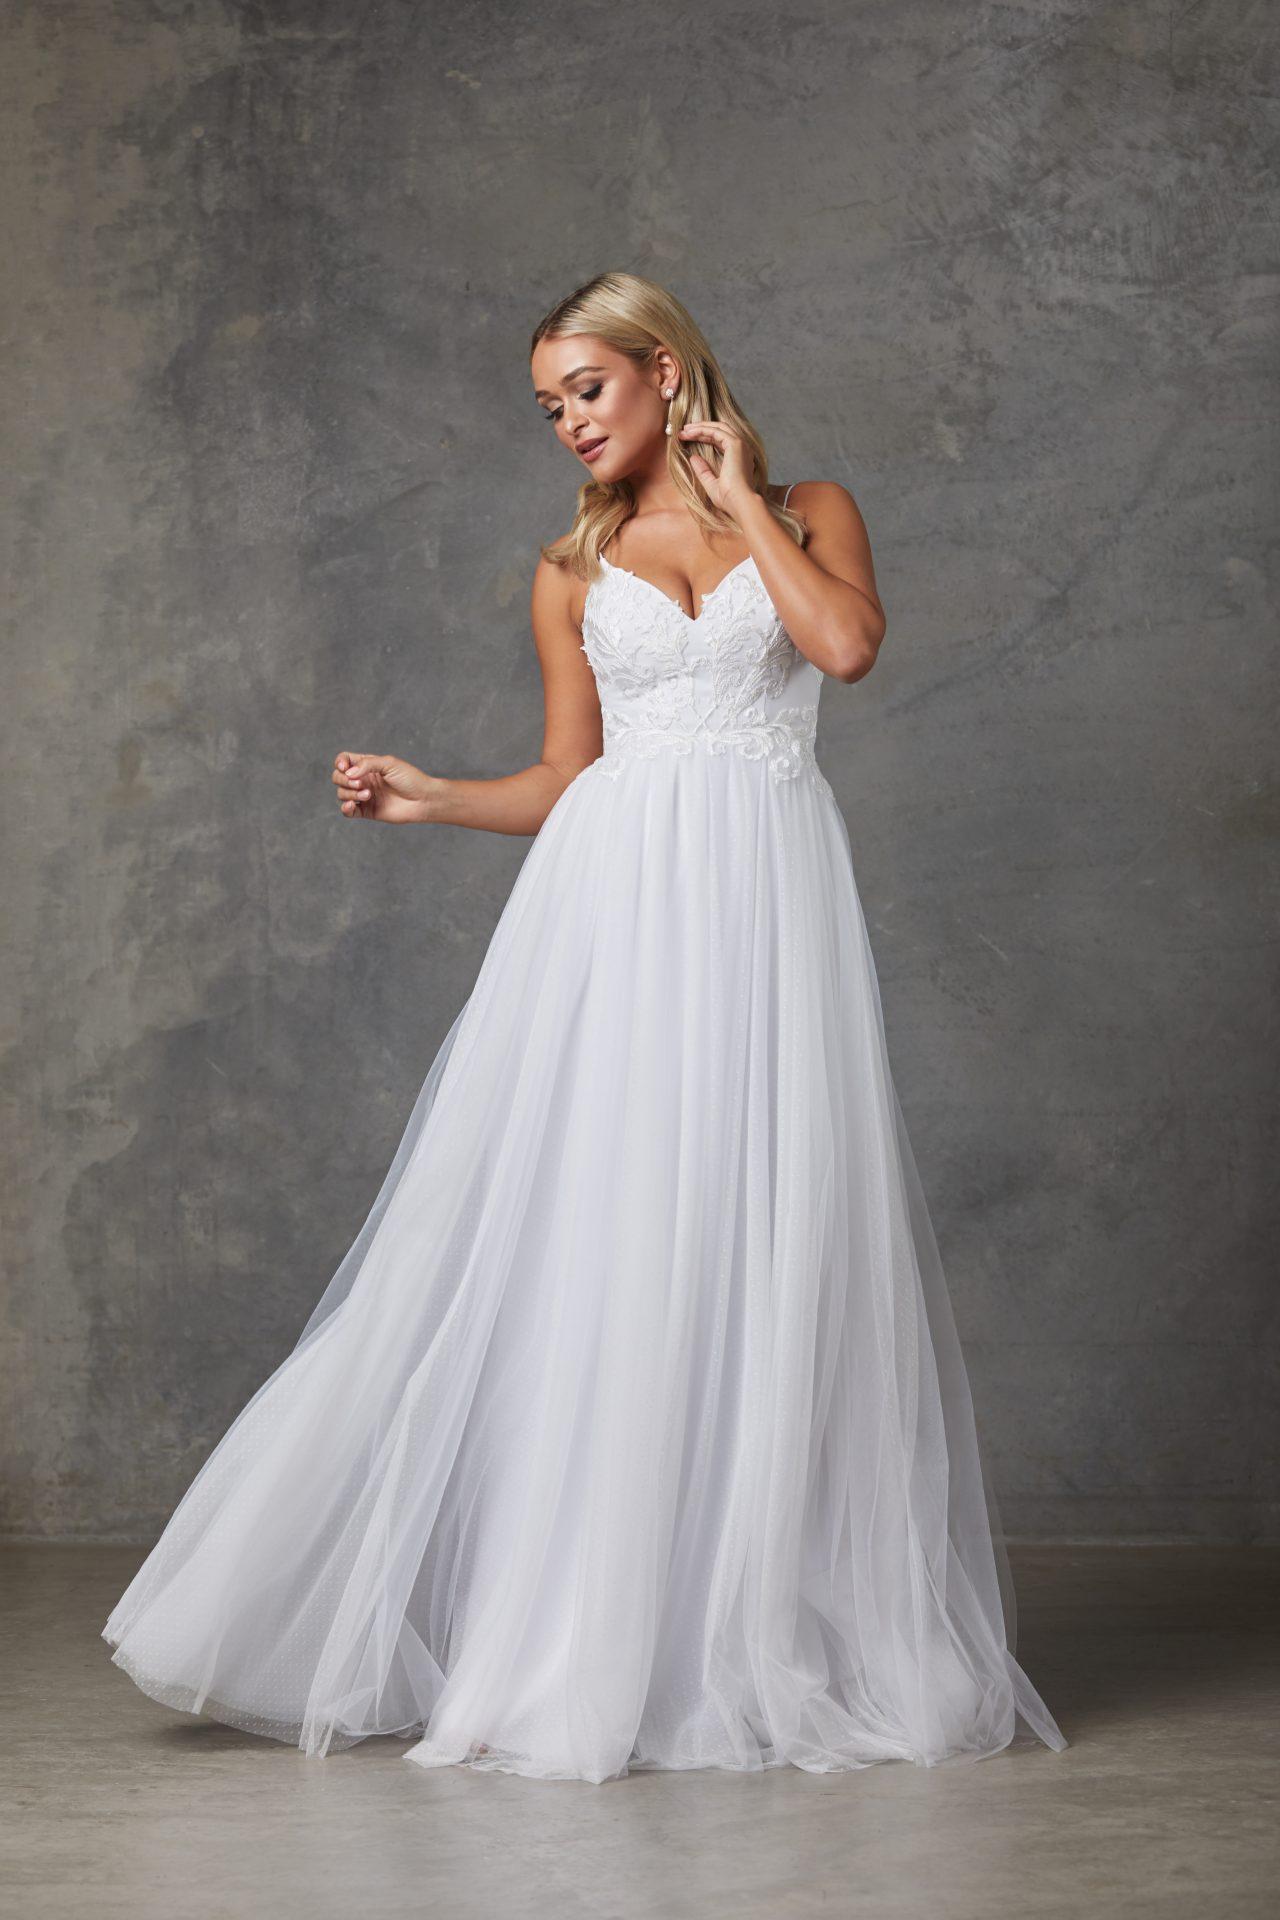 9c5dd4cfde Aubriel - lace - tulle - 2019 Brides Collection - Tania Olsen Couture